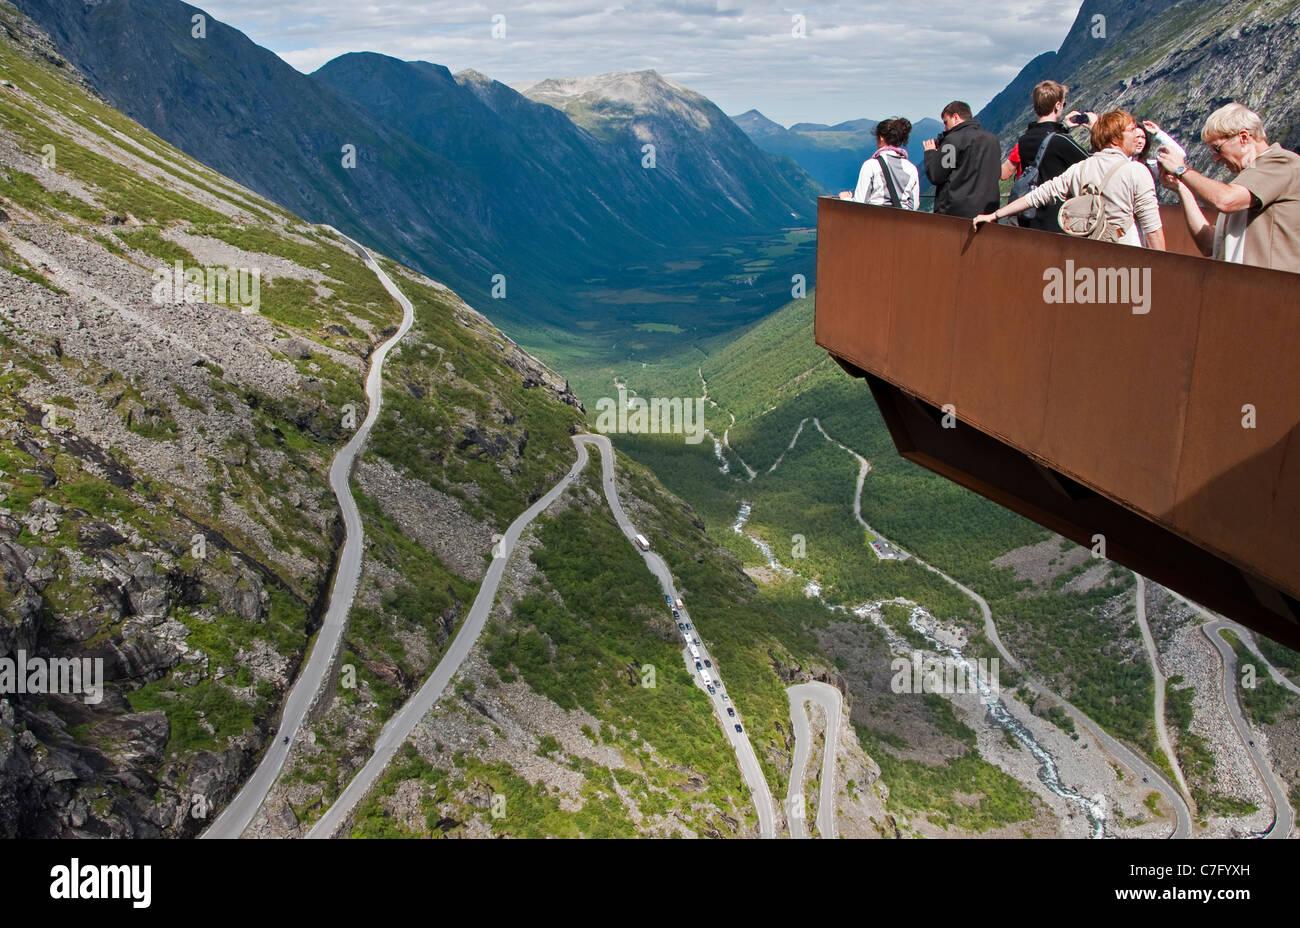 Scenic observation platform overlooking Trollstigen (Troll's Ladder) switchback mountain road in Norway's - Stock Image